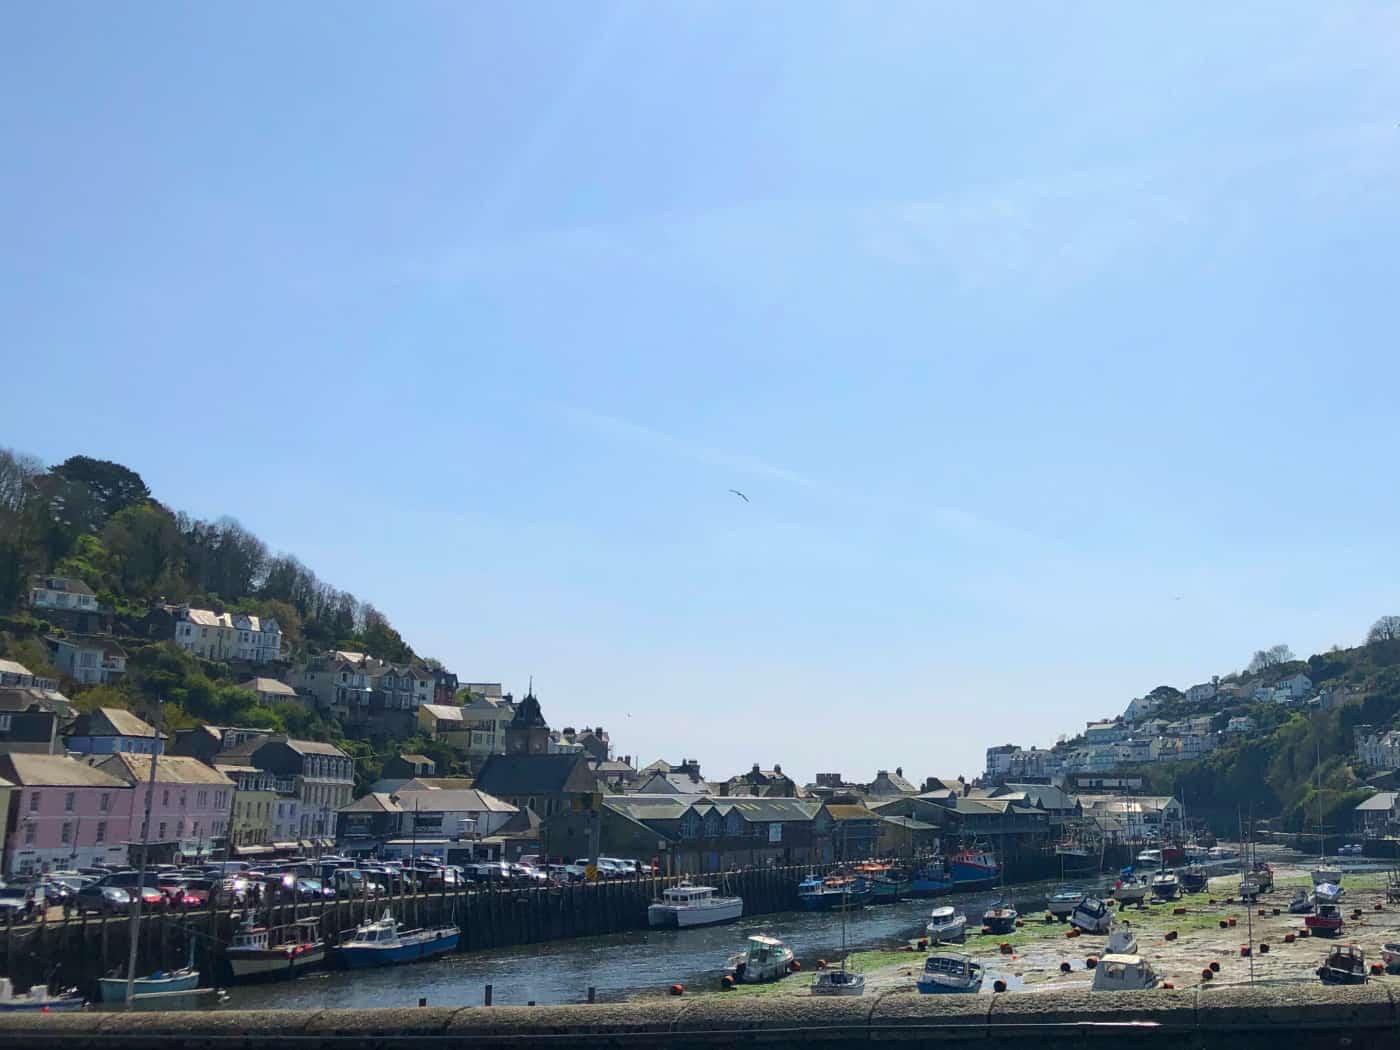 Looe Cornwall from the bridge